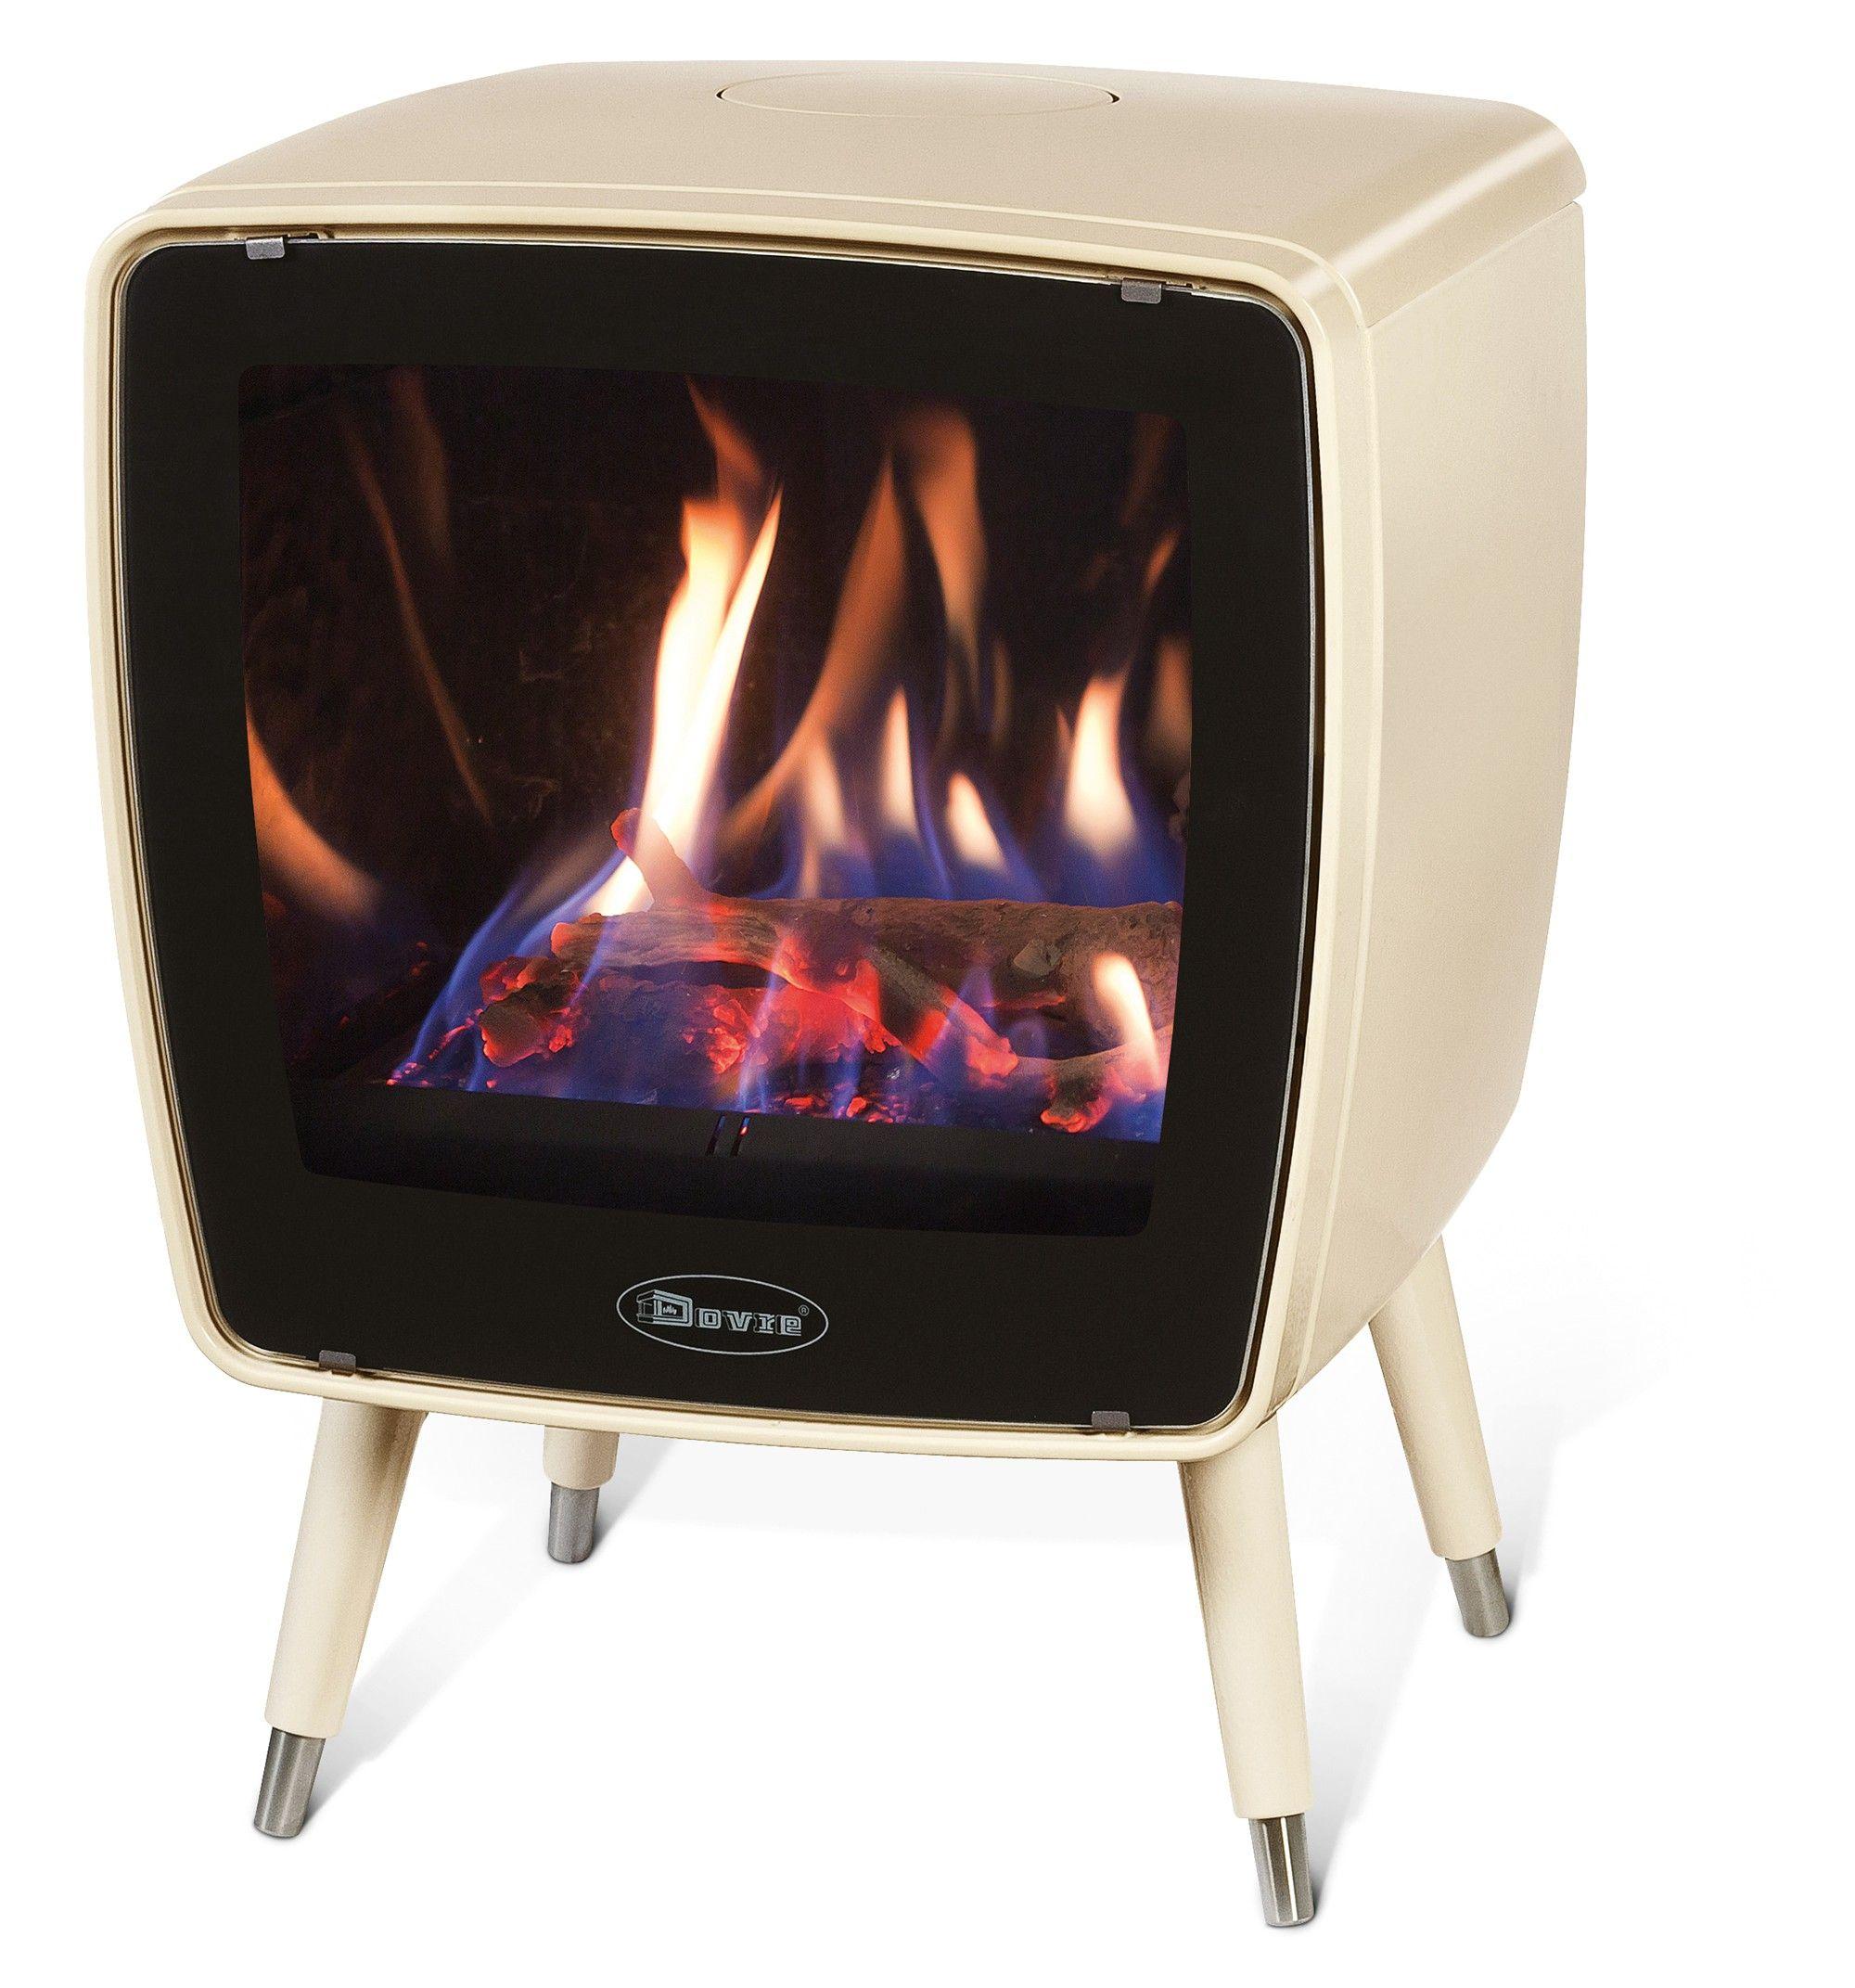 dovre gas kaminofen vintage 35 ga gasofen kaminofen wohnzimmer pinterest. Black Bedroom Furniture Sets. Home Design Ideas